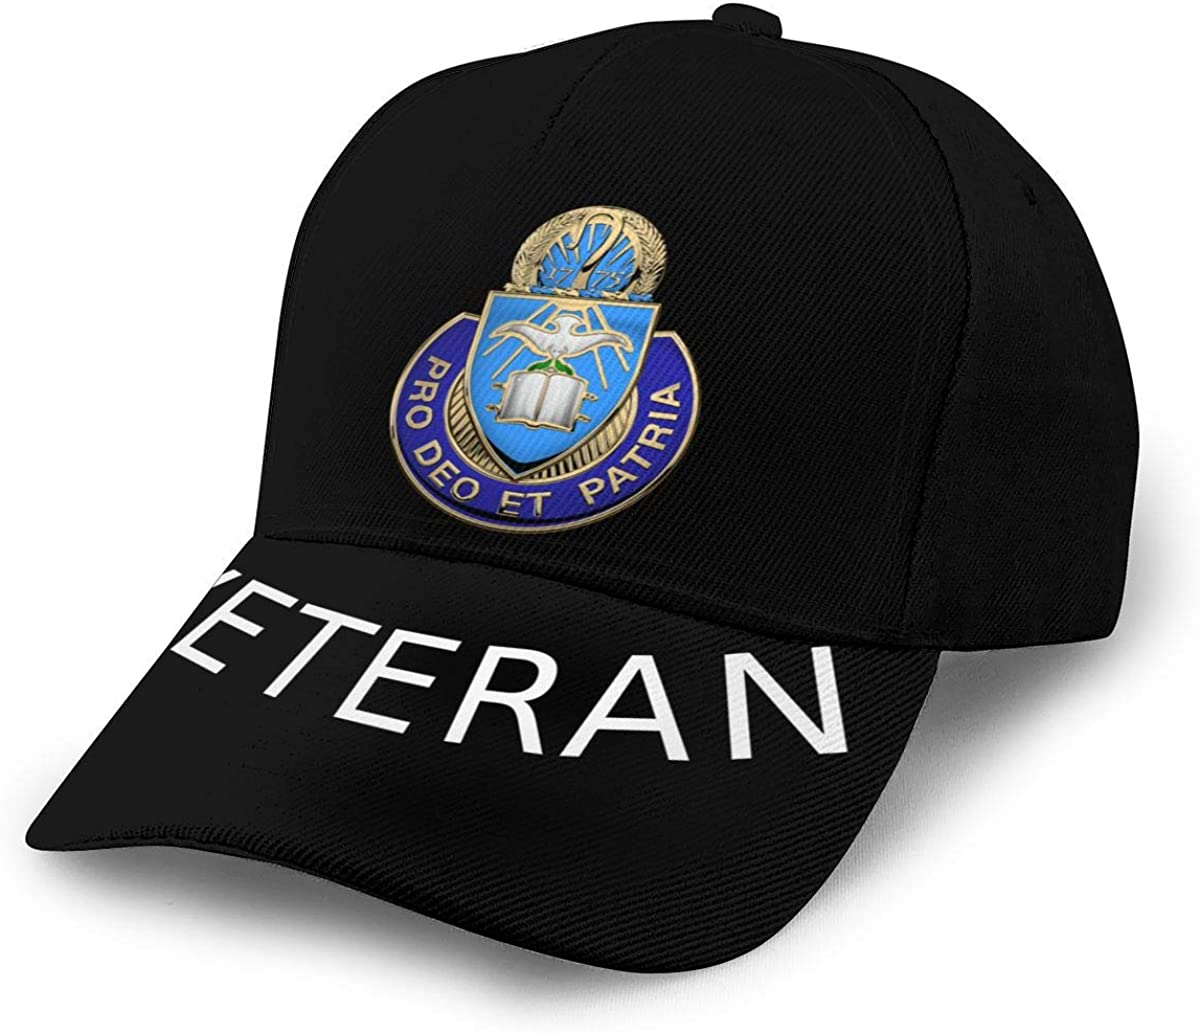 U S Army Chaplain Corps Regimental Insignia Baseball Cap Dad Hat Unisex Classic Sports Hat Peaked Cap